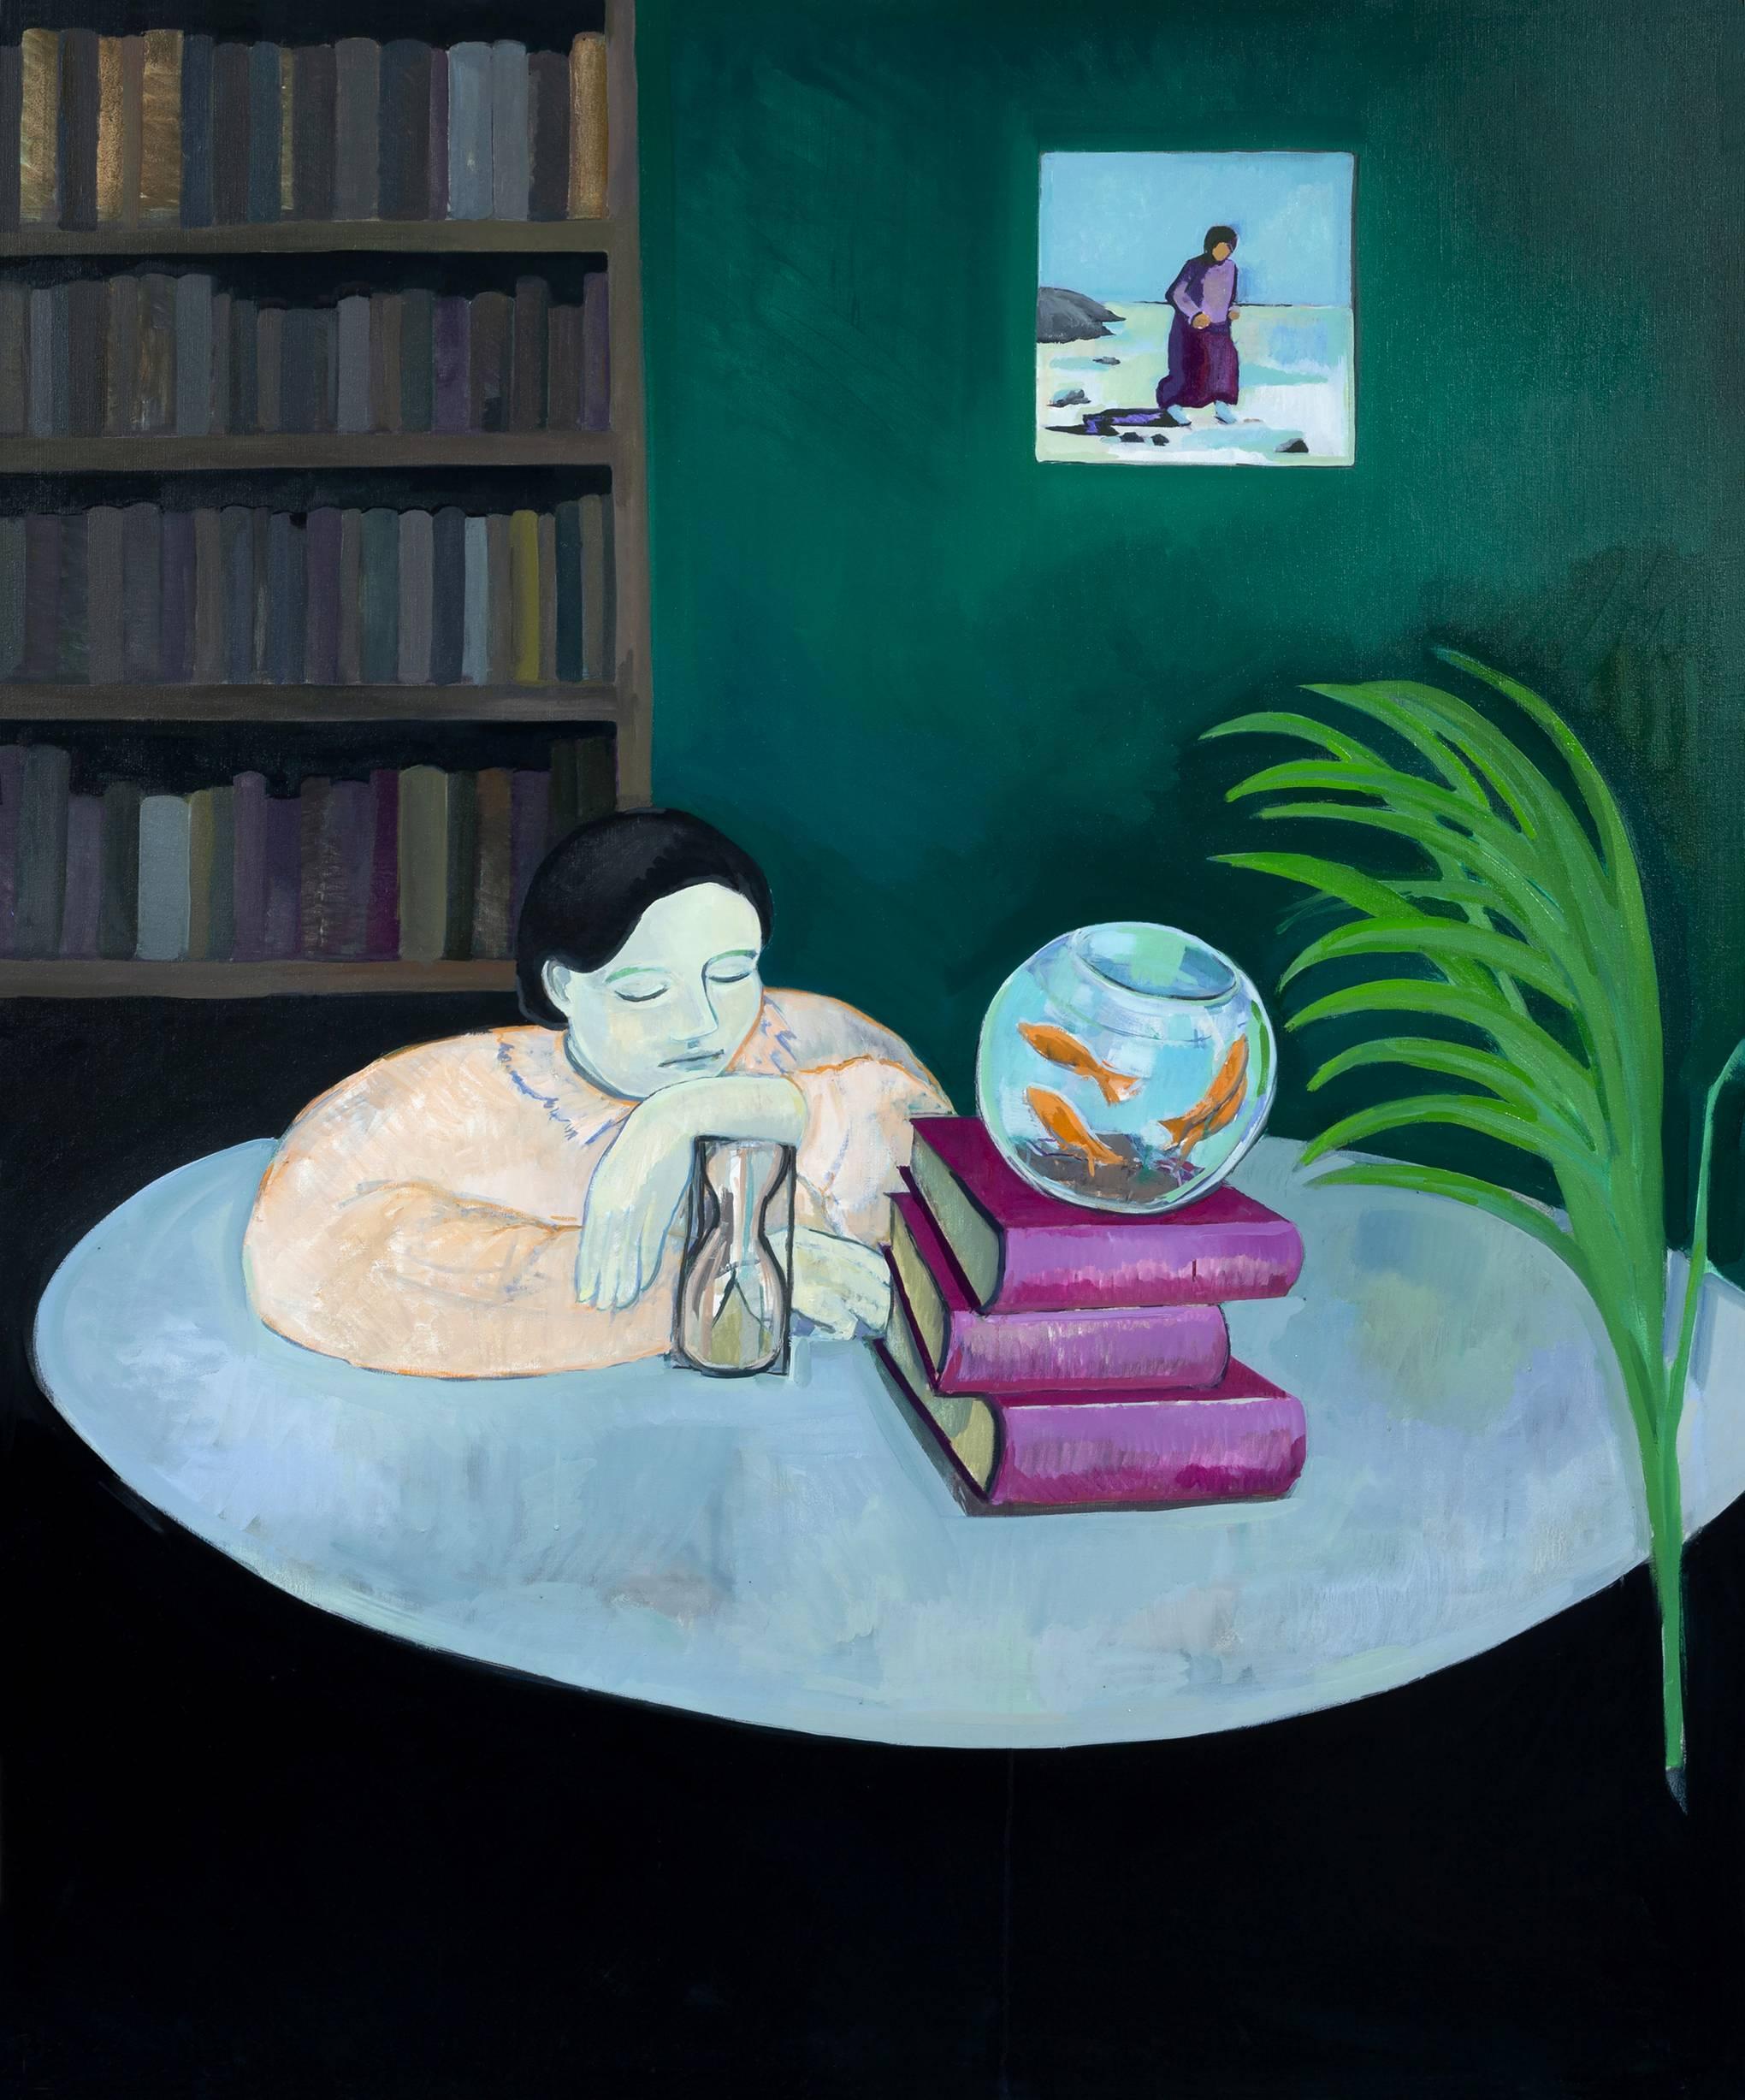 Nancy Cadogan on the relationship between art and interiors